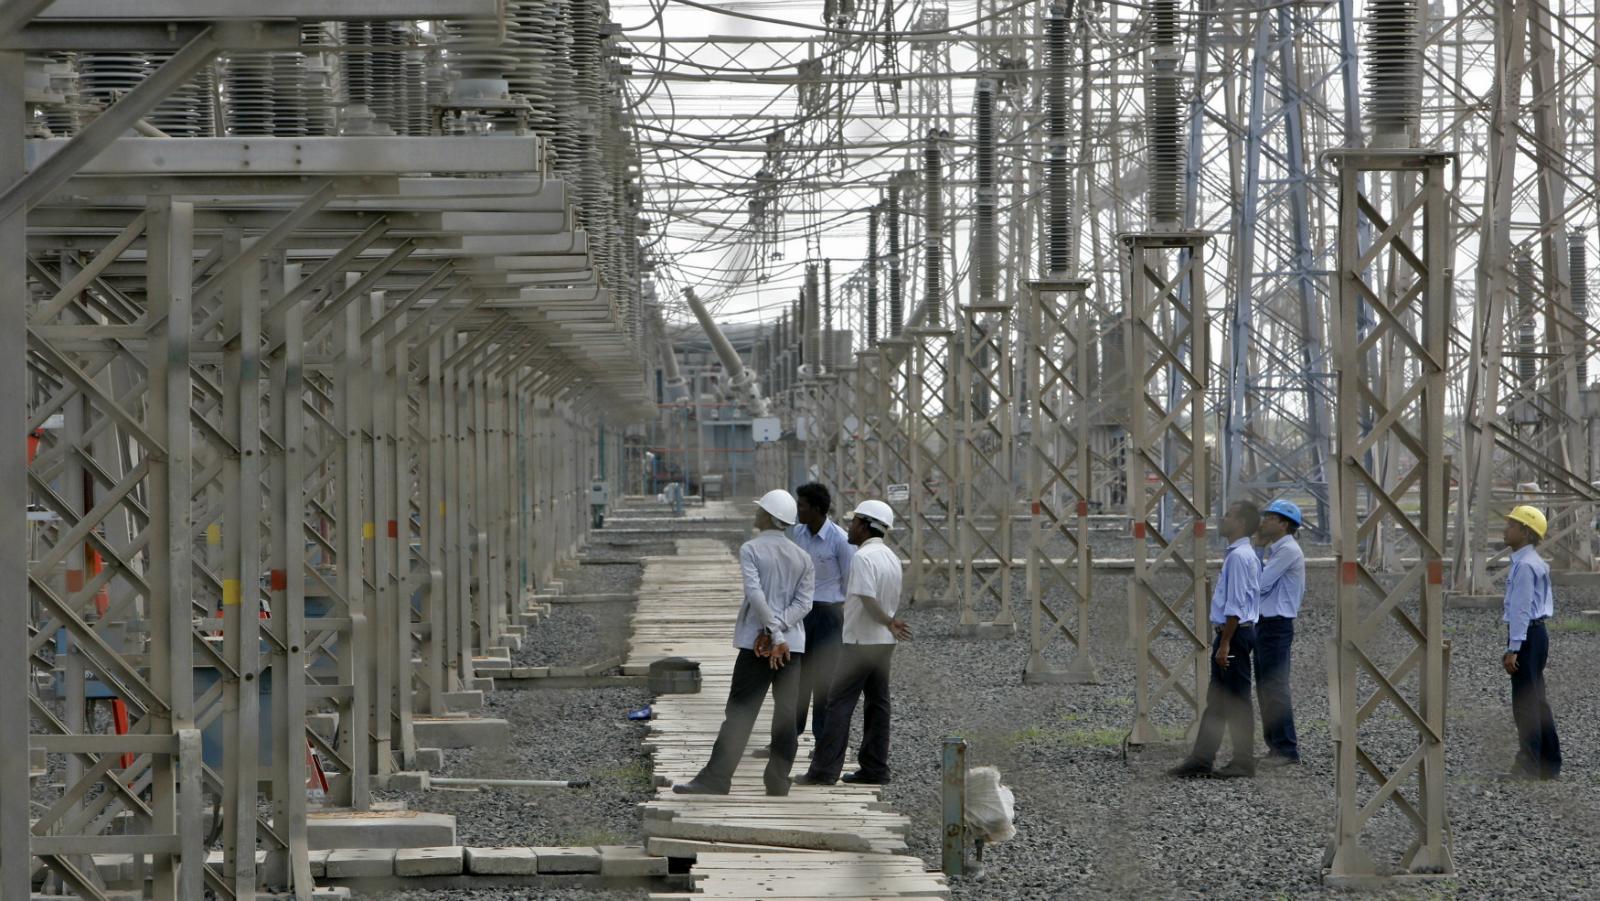 BHEL-India-Renewable energy-Engineering-Power